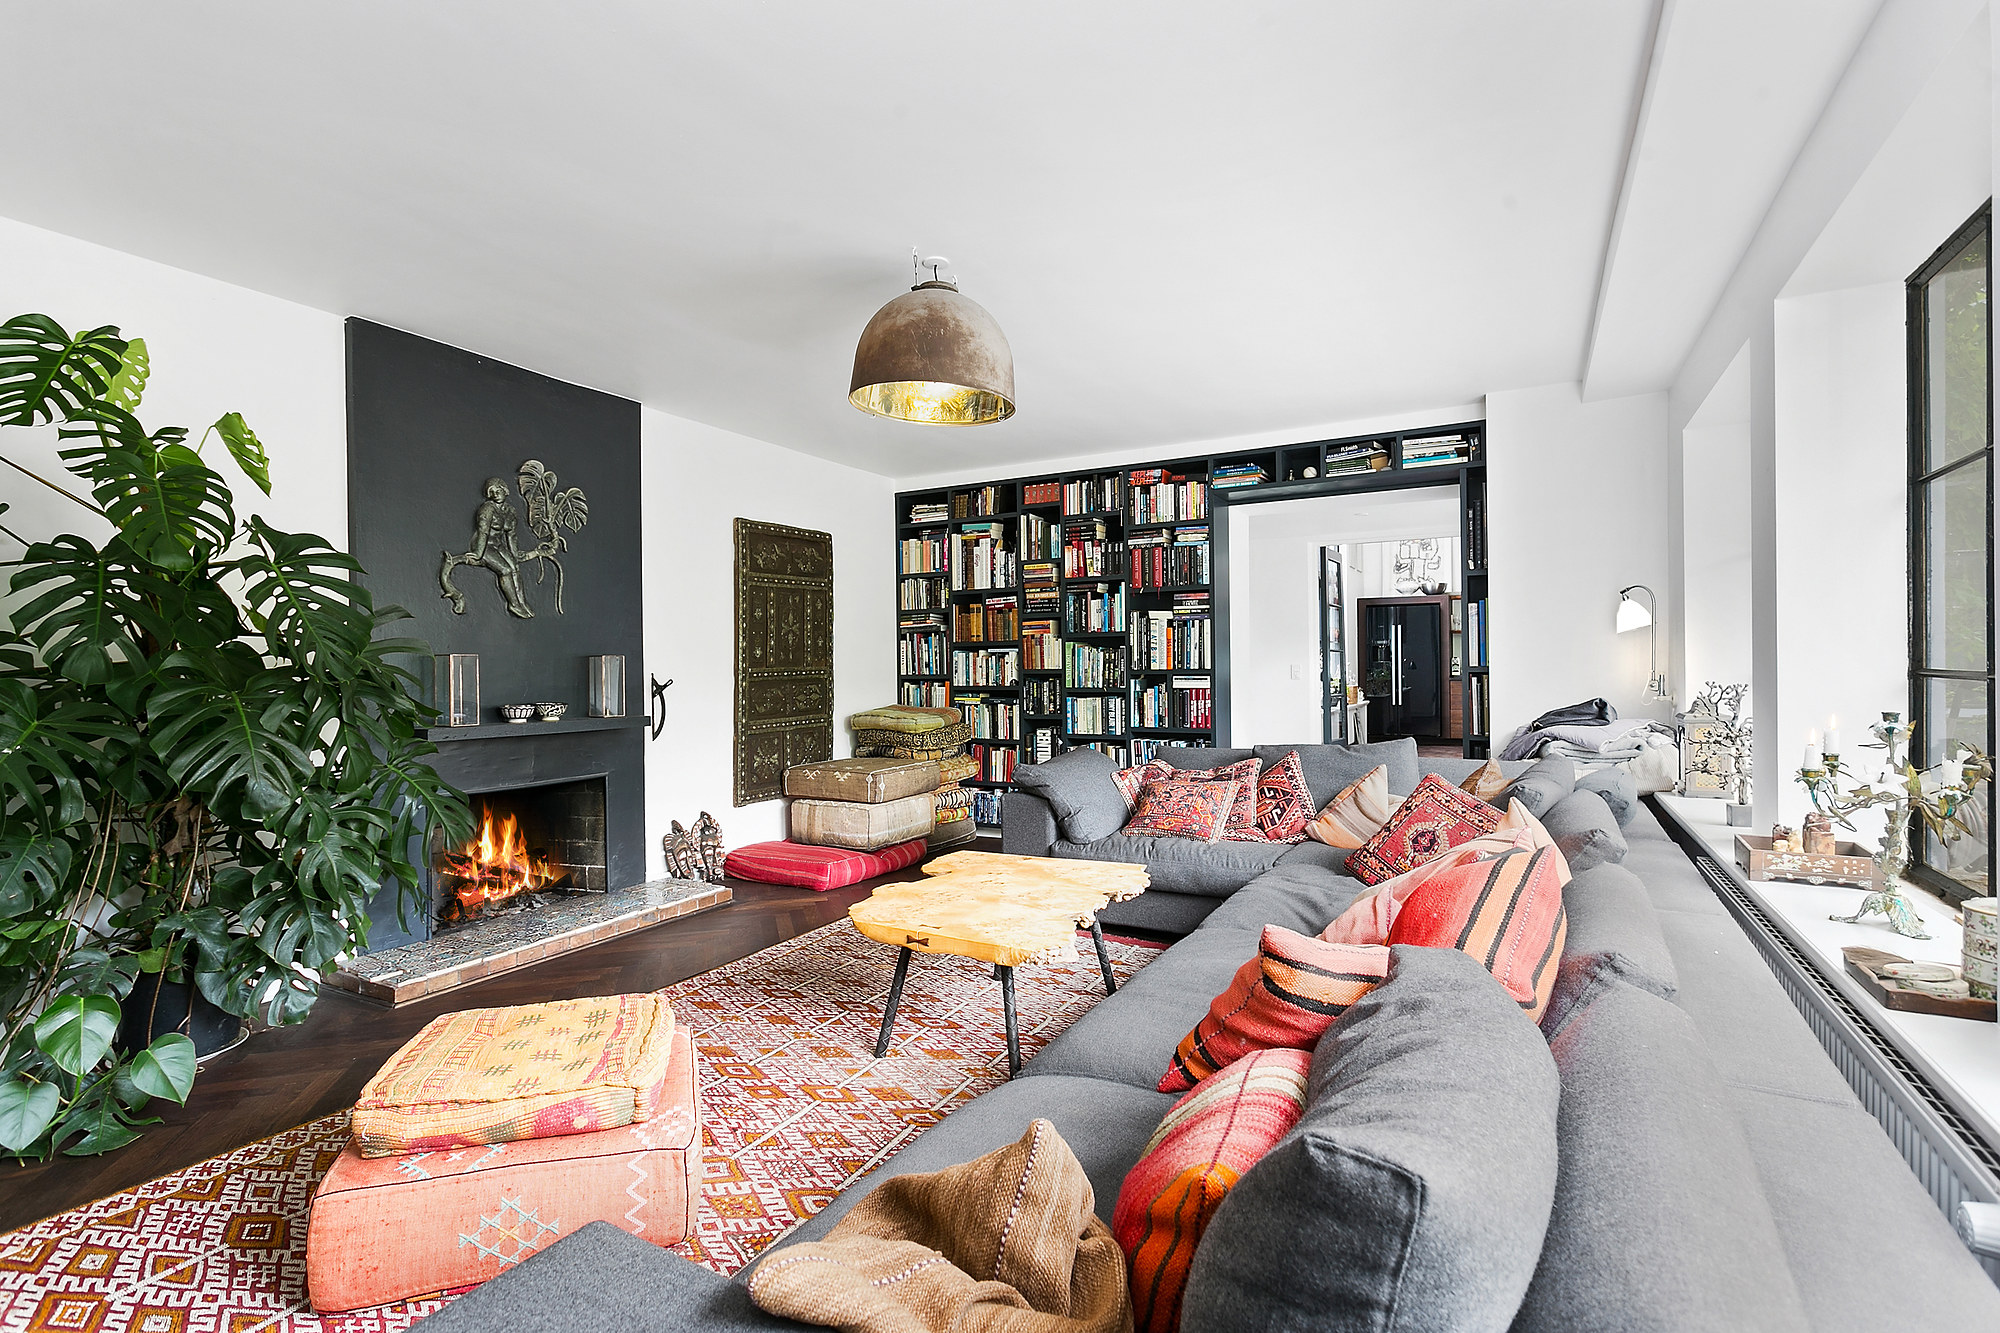 гостиная книги камин комнатное дерево подушки